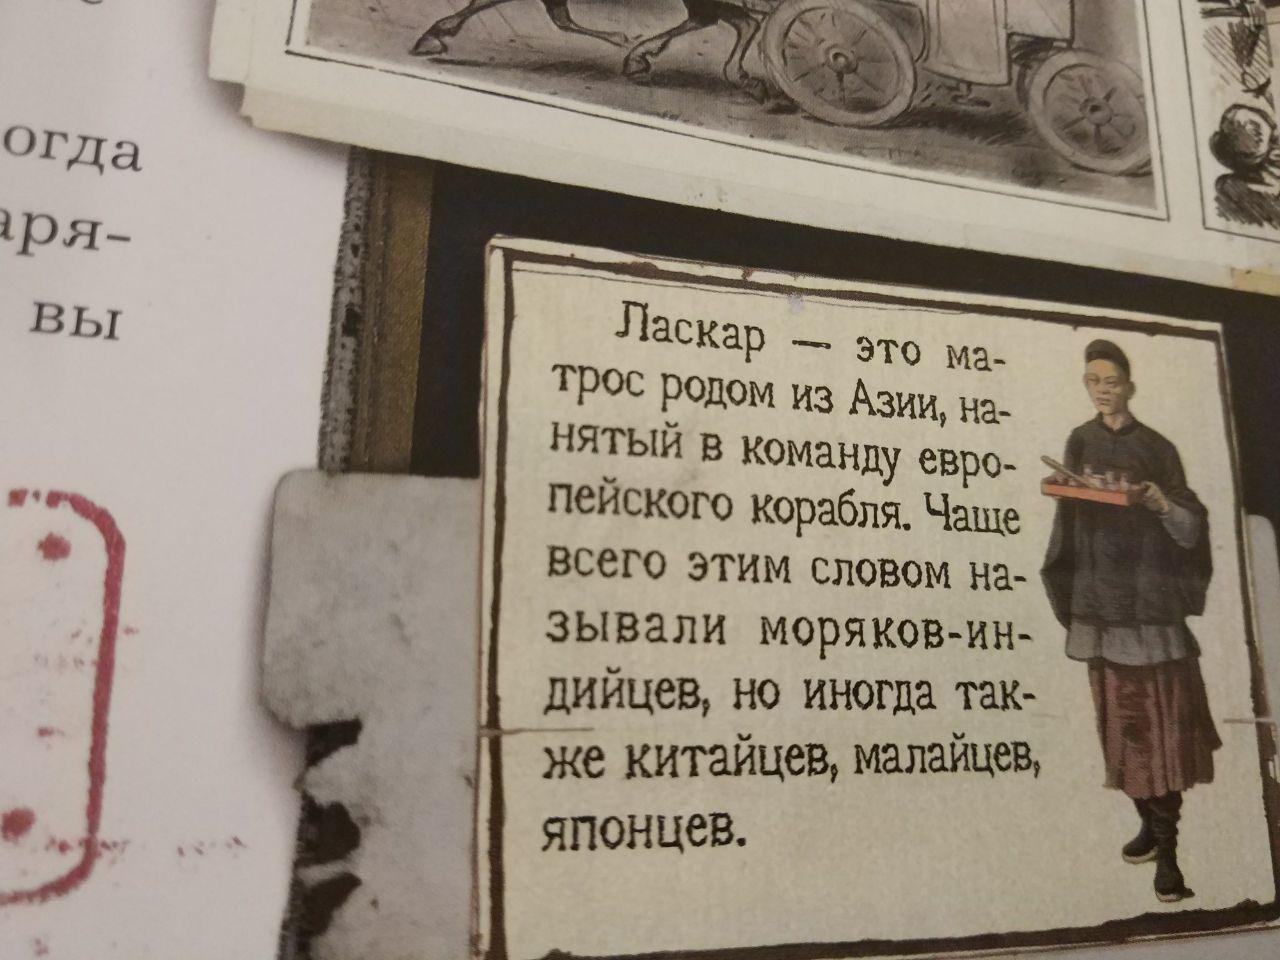 http://s3.uploads.ru/tgZ4W.jpg